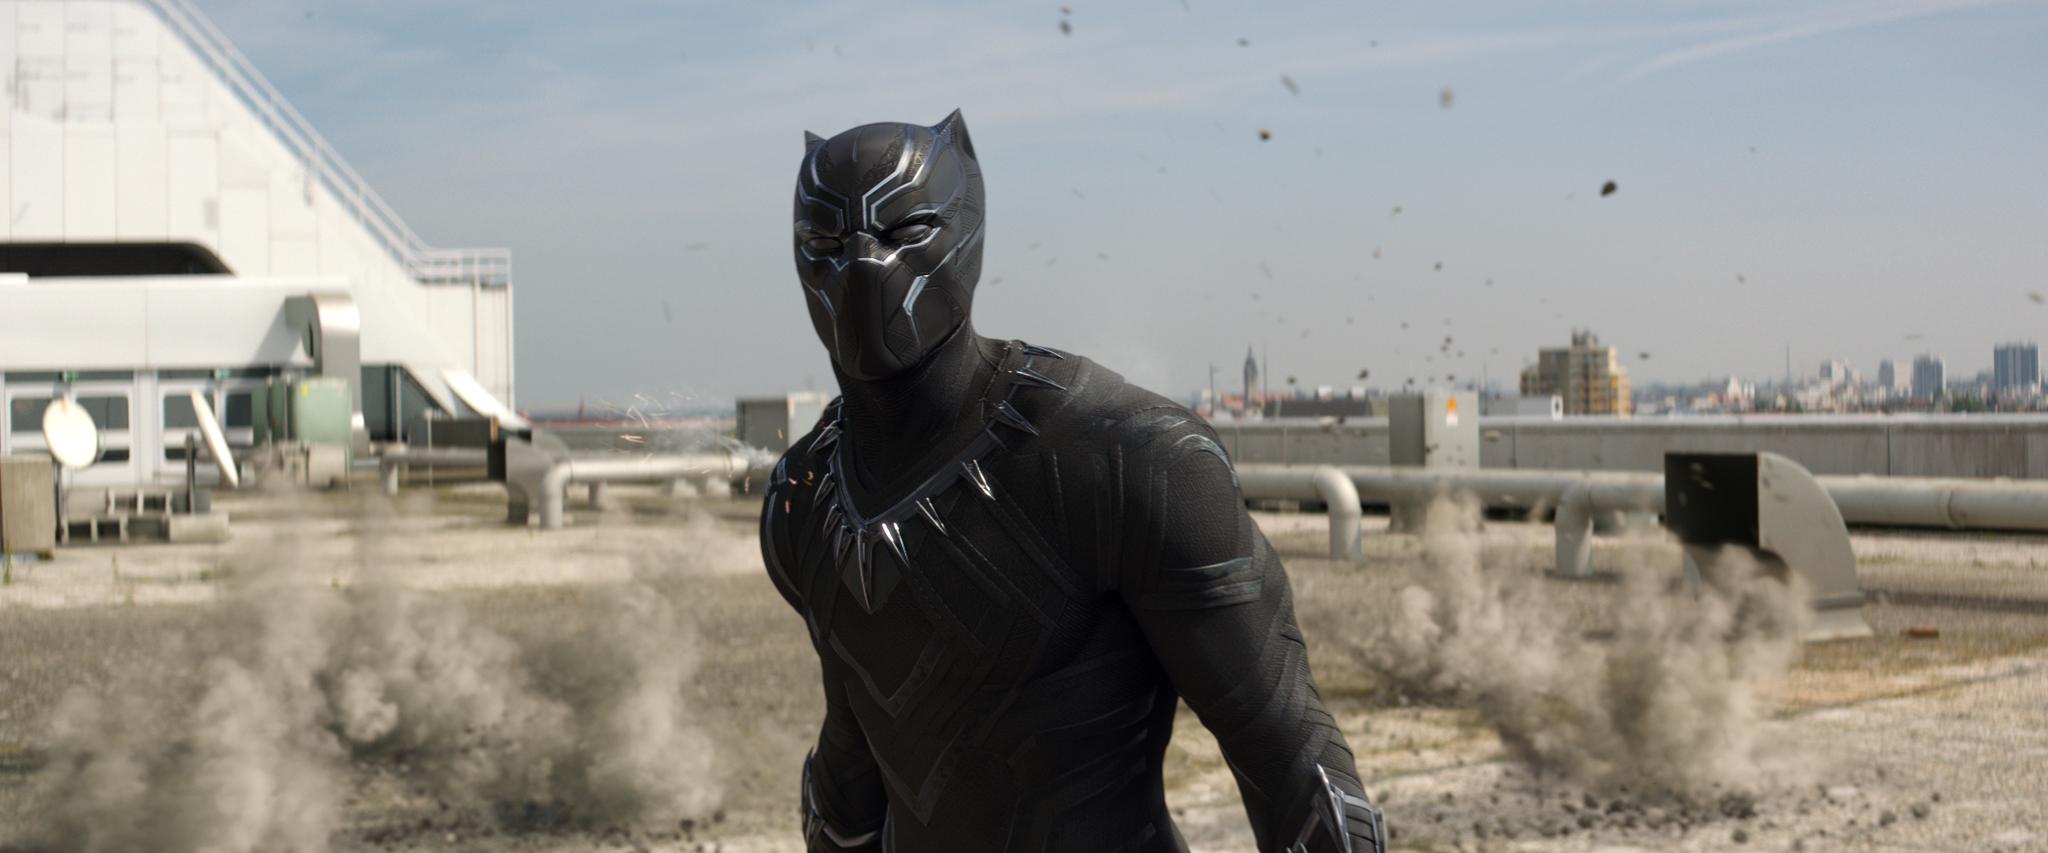 Chadwick Boseman in Captain America: Civil War (2016)